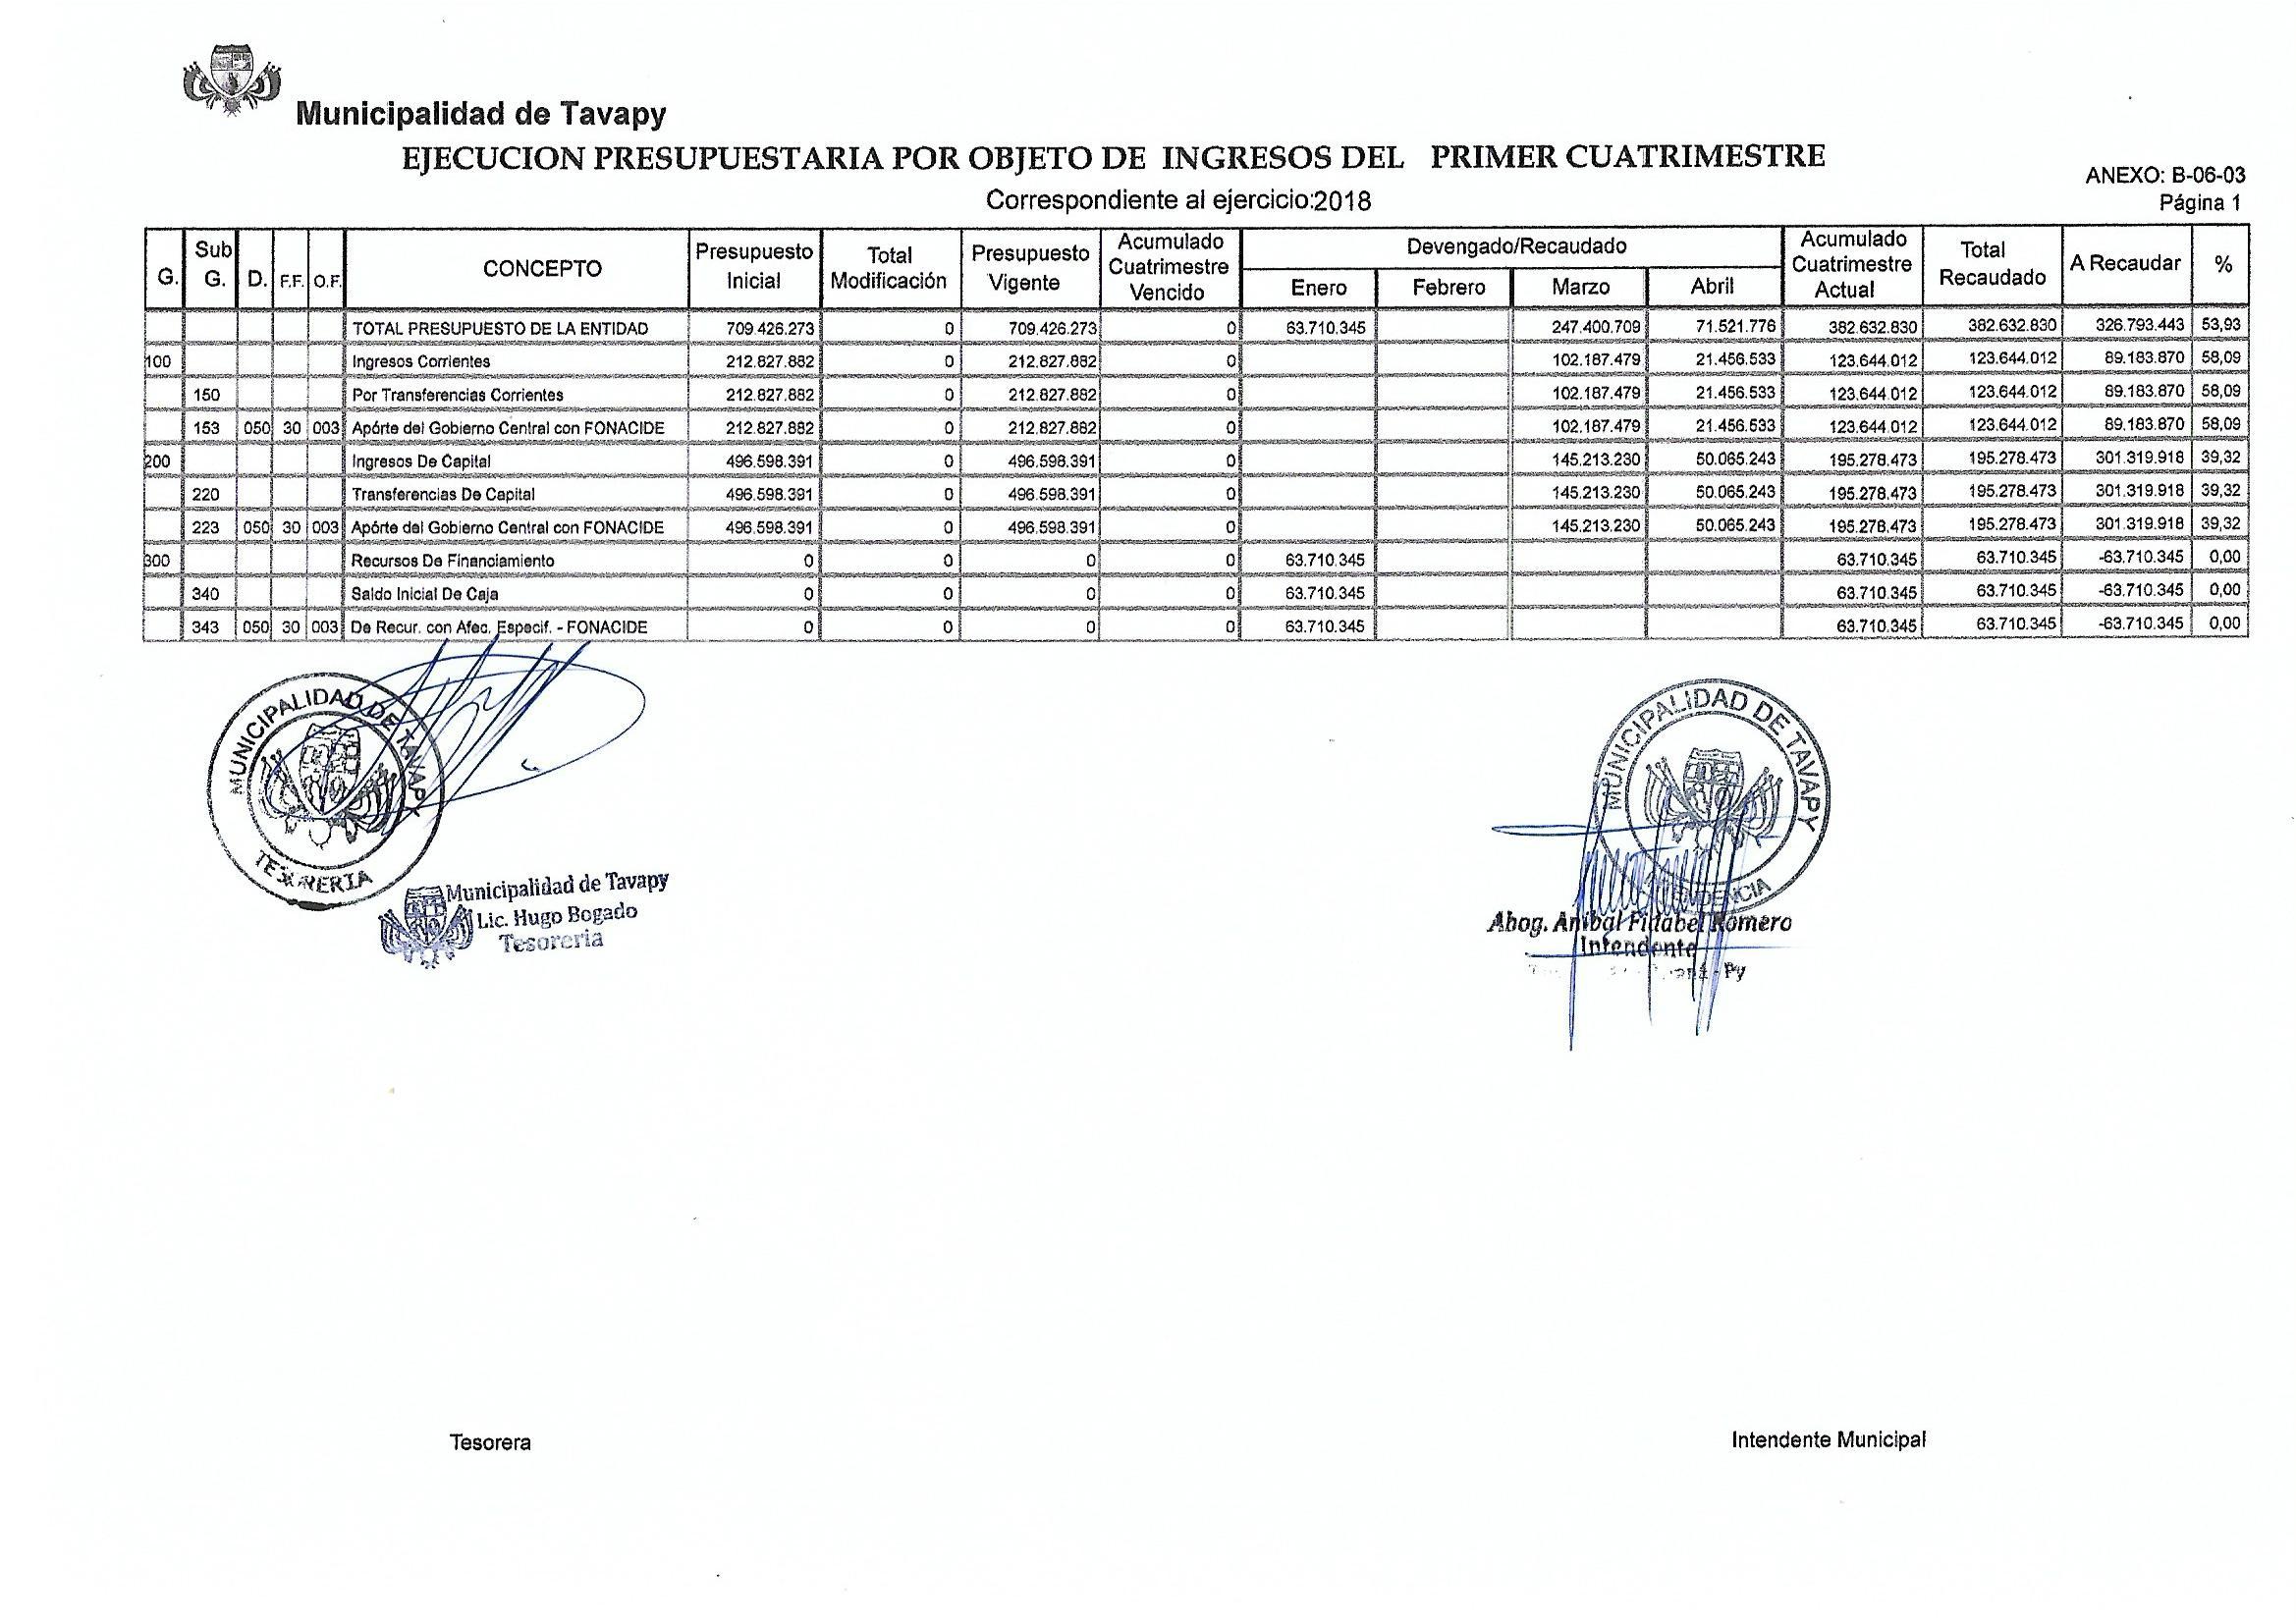 informe-de-1er-cuatrimestre-ingresos-2018-fonacide